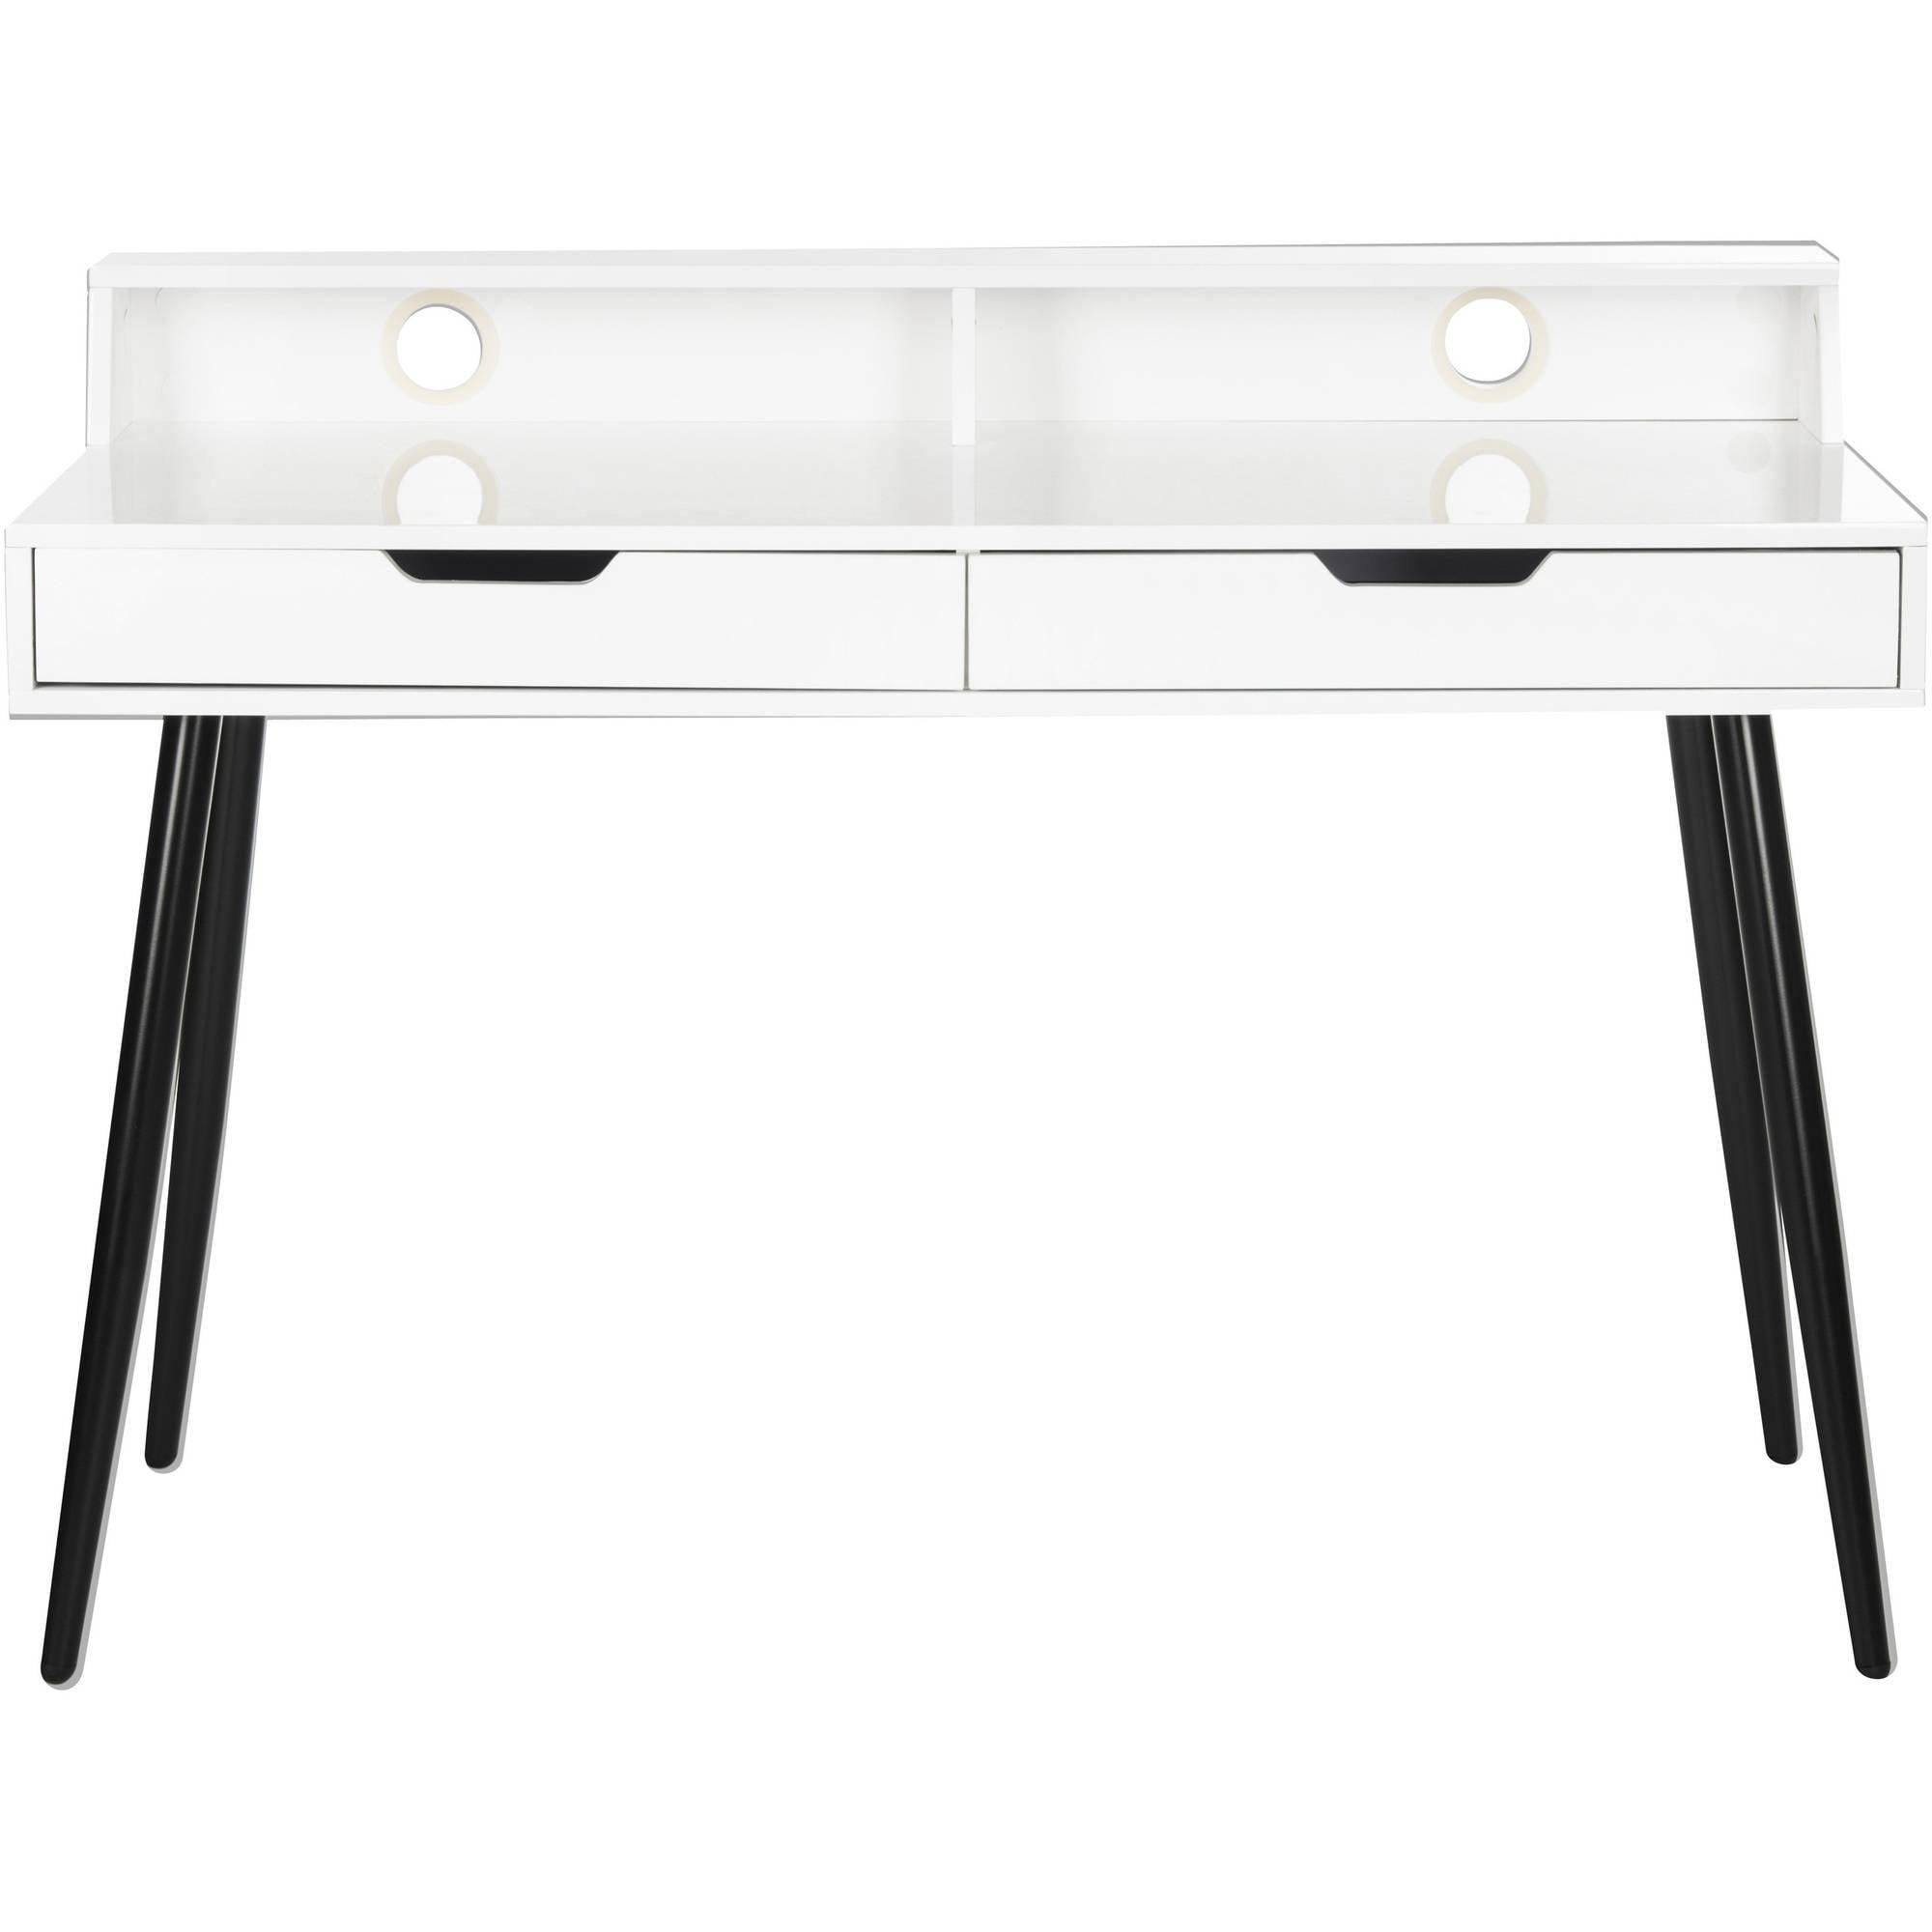 "Safavieh Cairo 47"" Width Mid Centry Retro 2-Drawer High Gloss Writing Desk, White by Safavieh"